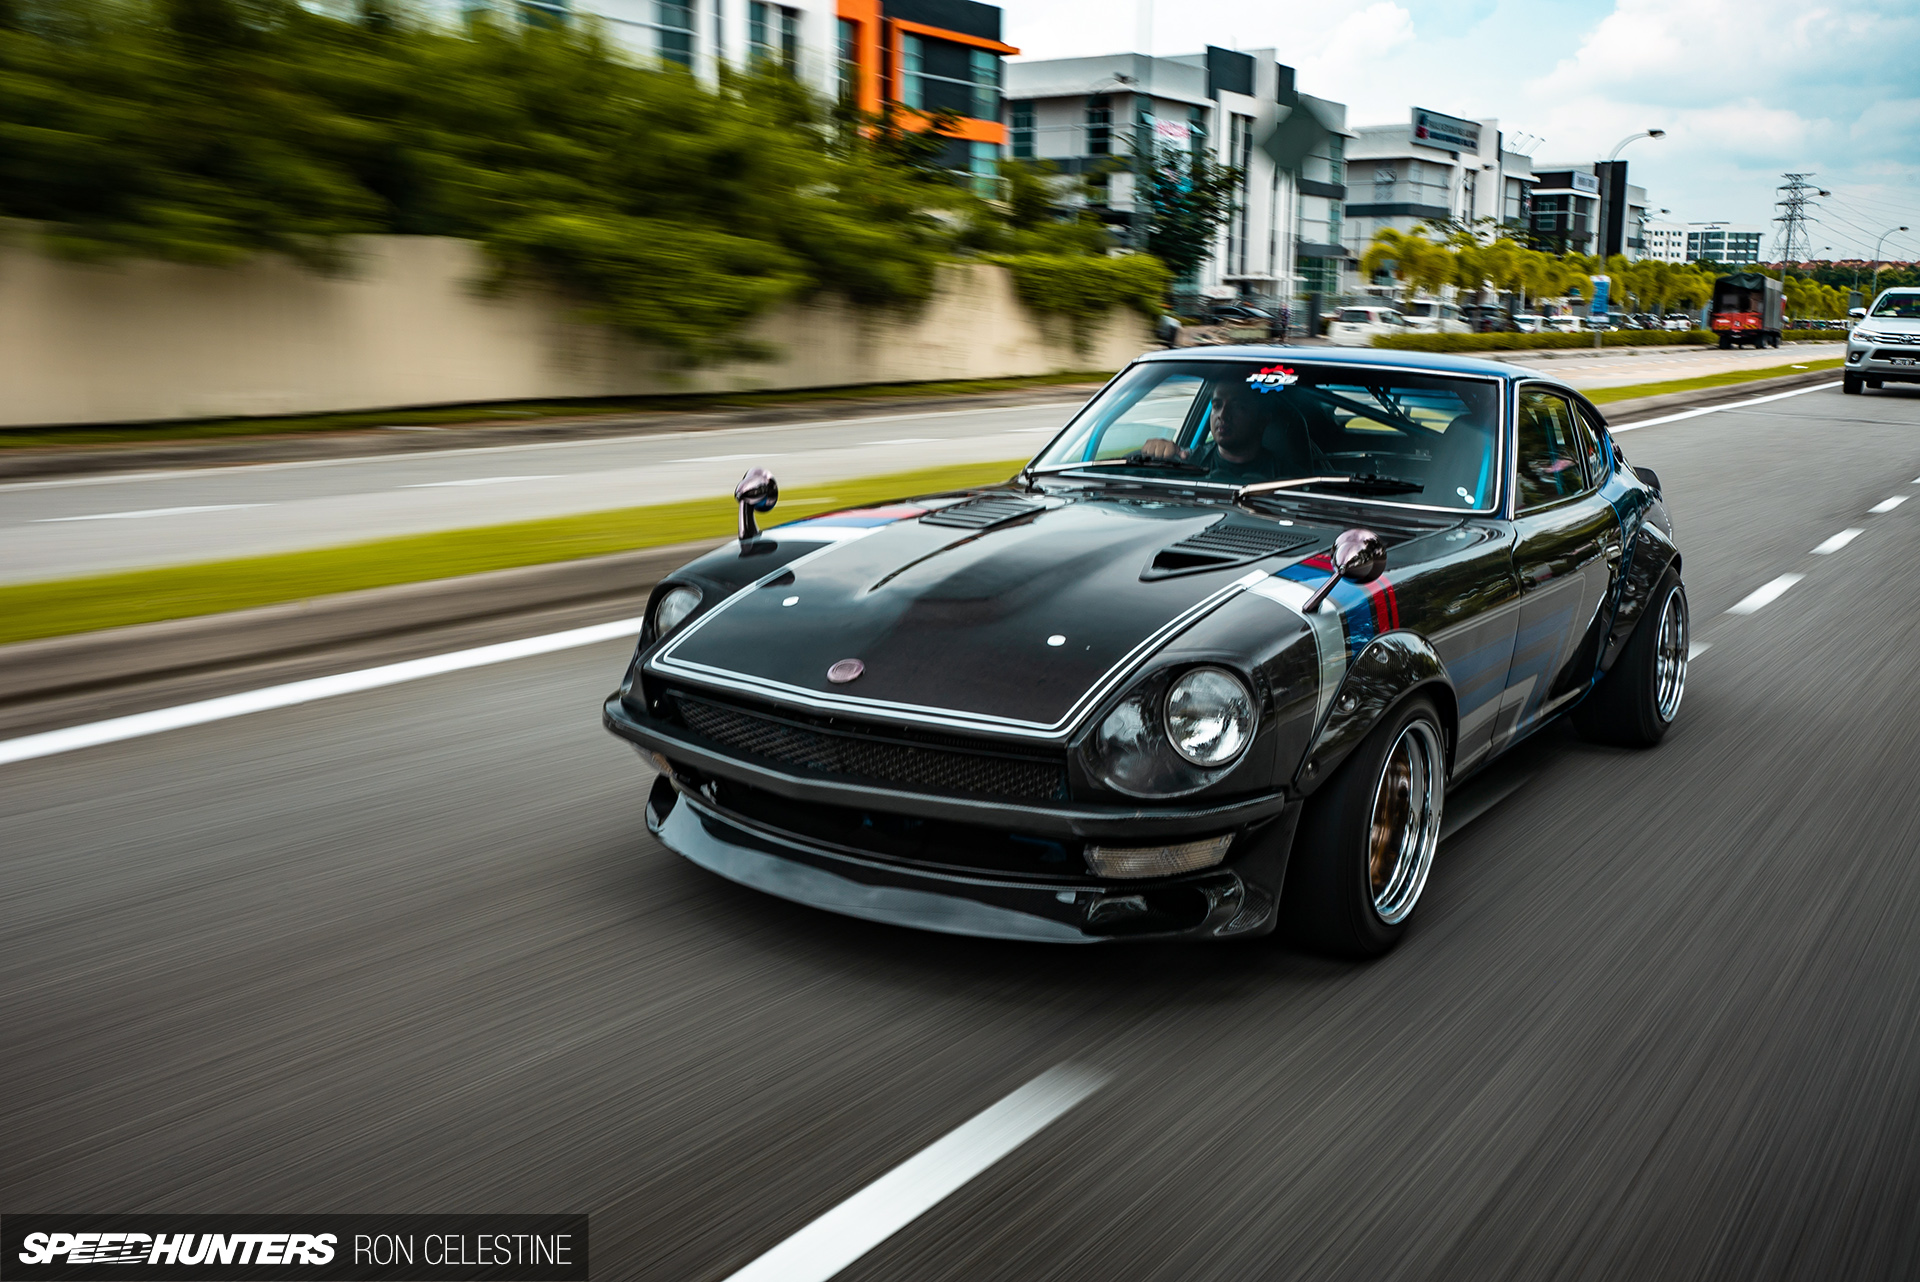 R Tune Garage's 3.4L Carbon Fiber Datsun Z